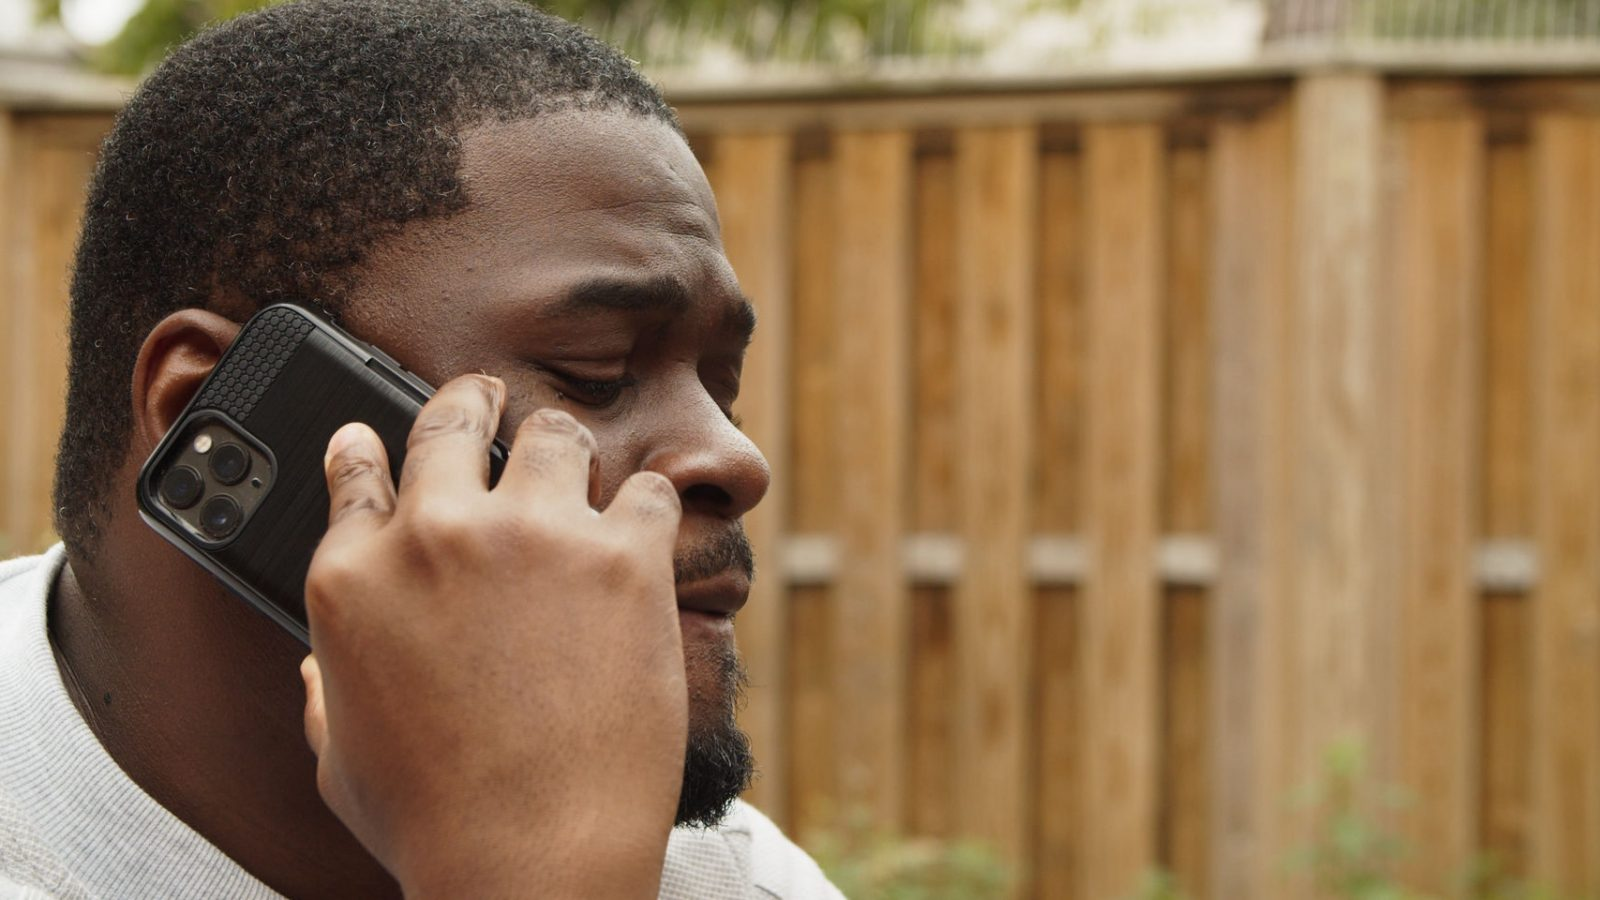 Still from short film Fraudsters' Trailer featuring Trésor Cédric, produced by Fresh Media Productions